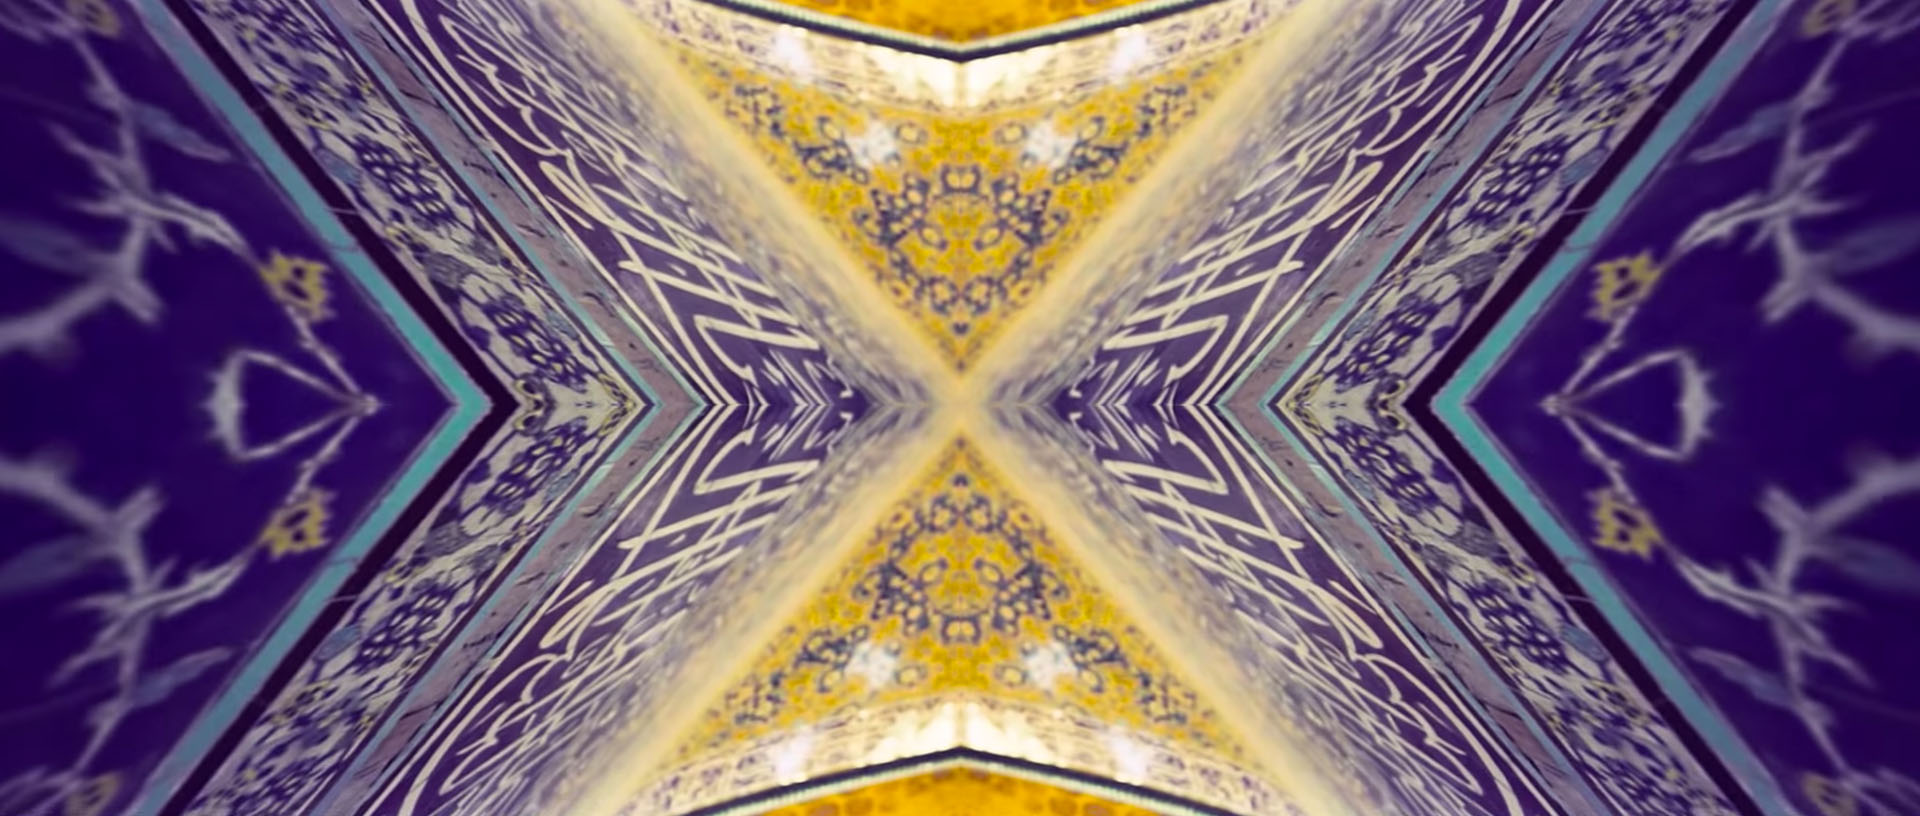 SACRED GEOMETRY — هندسه مقدس | Stanislas Giroux